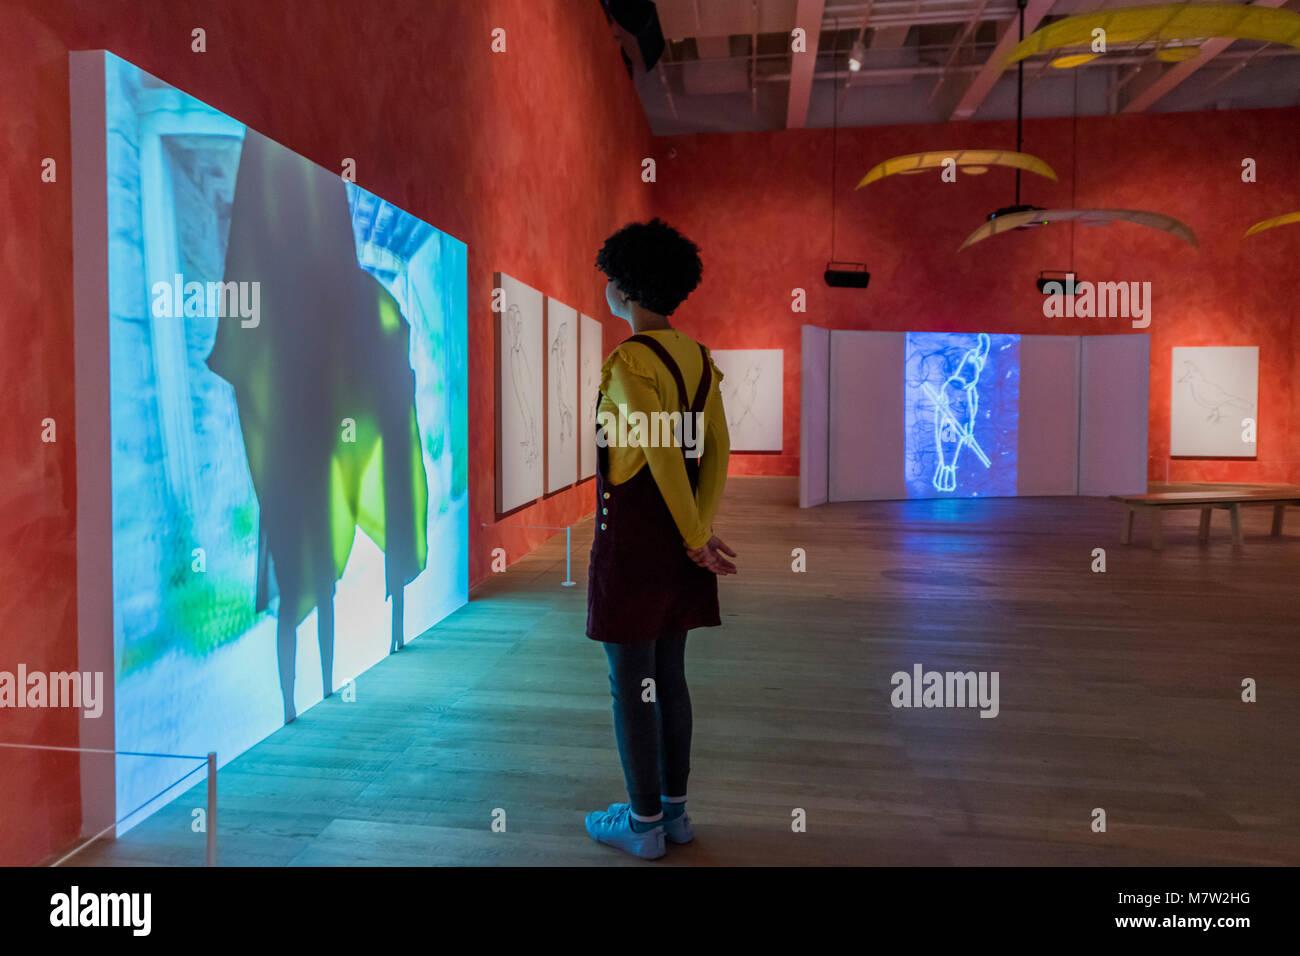 London, UK. 13th March, 2018. Stream or River, Flight or Pattern - Joan Jonas, Tate Modern opens largest survey Stock Photo